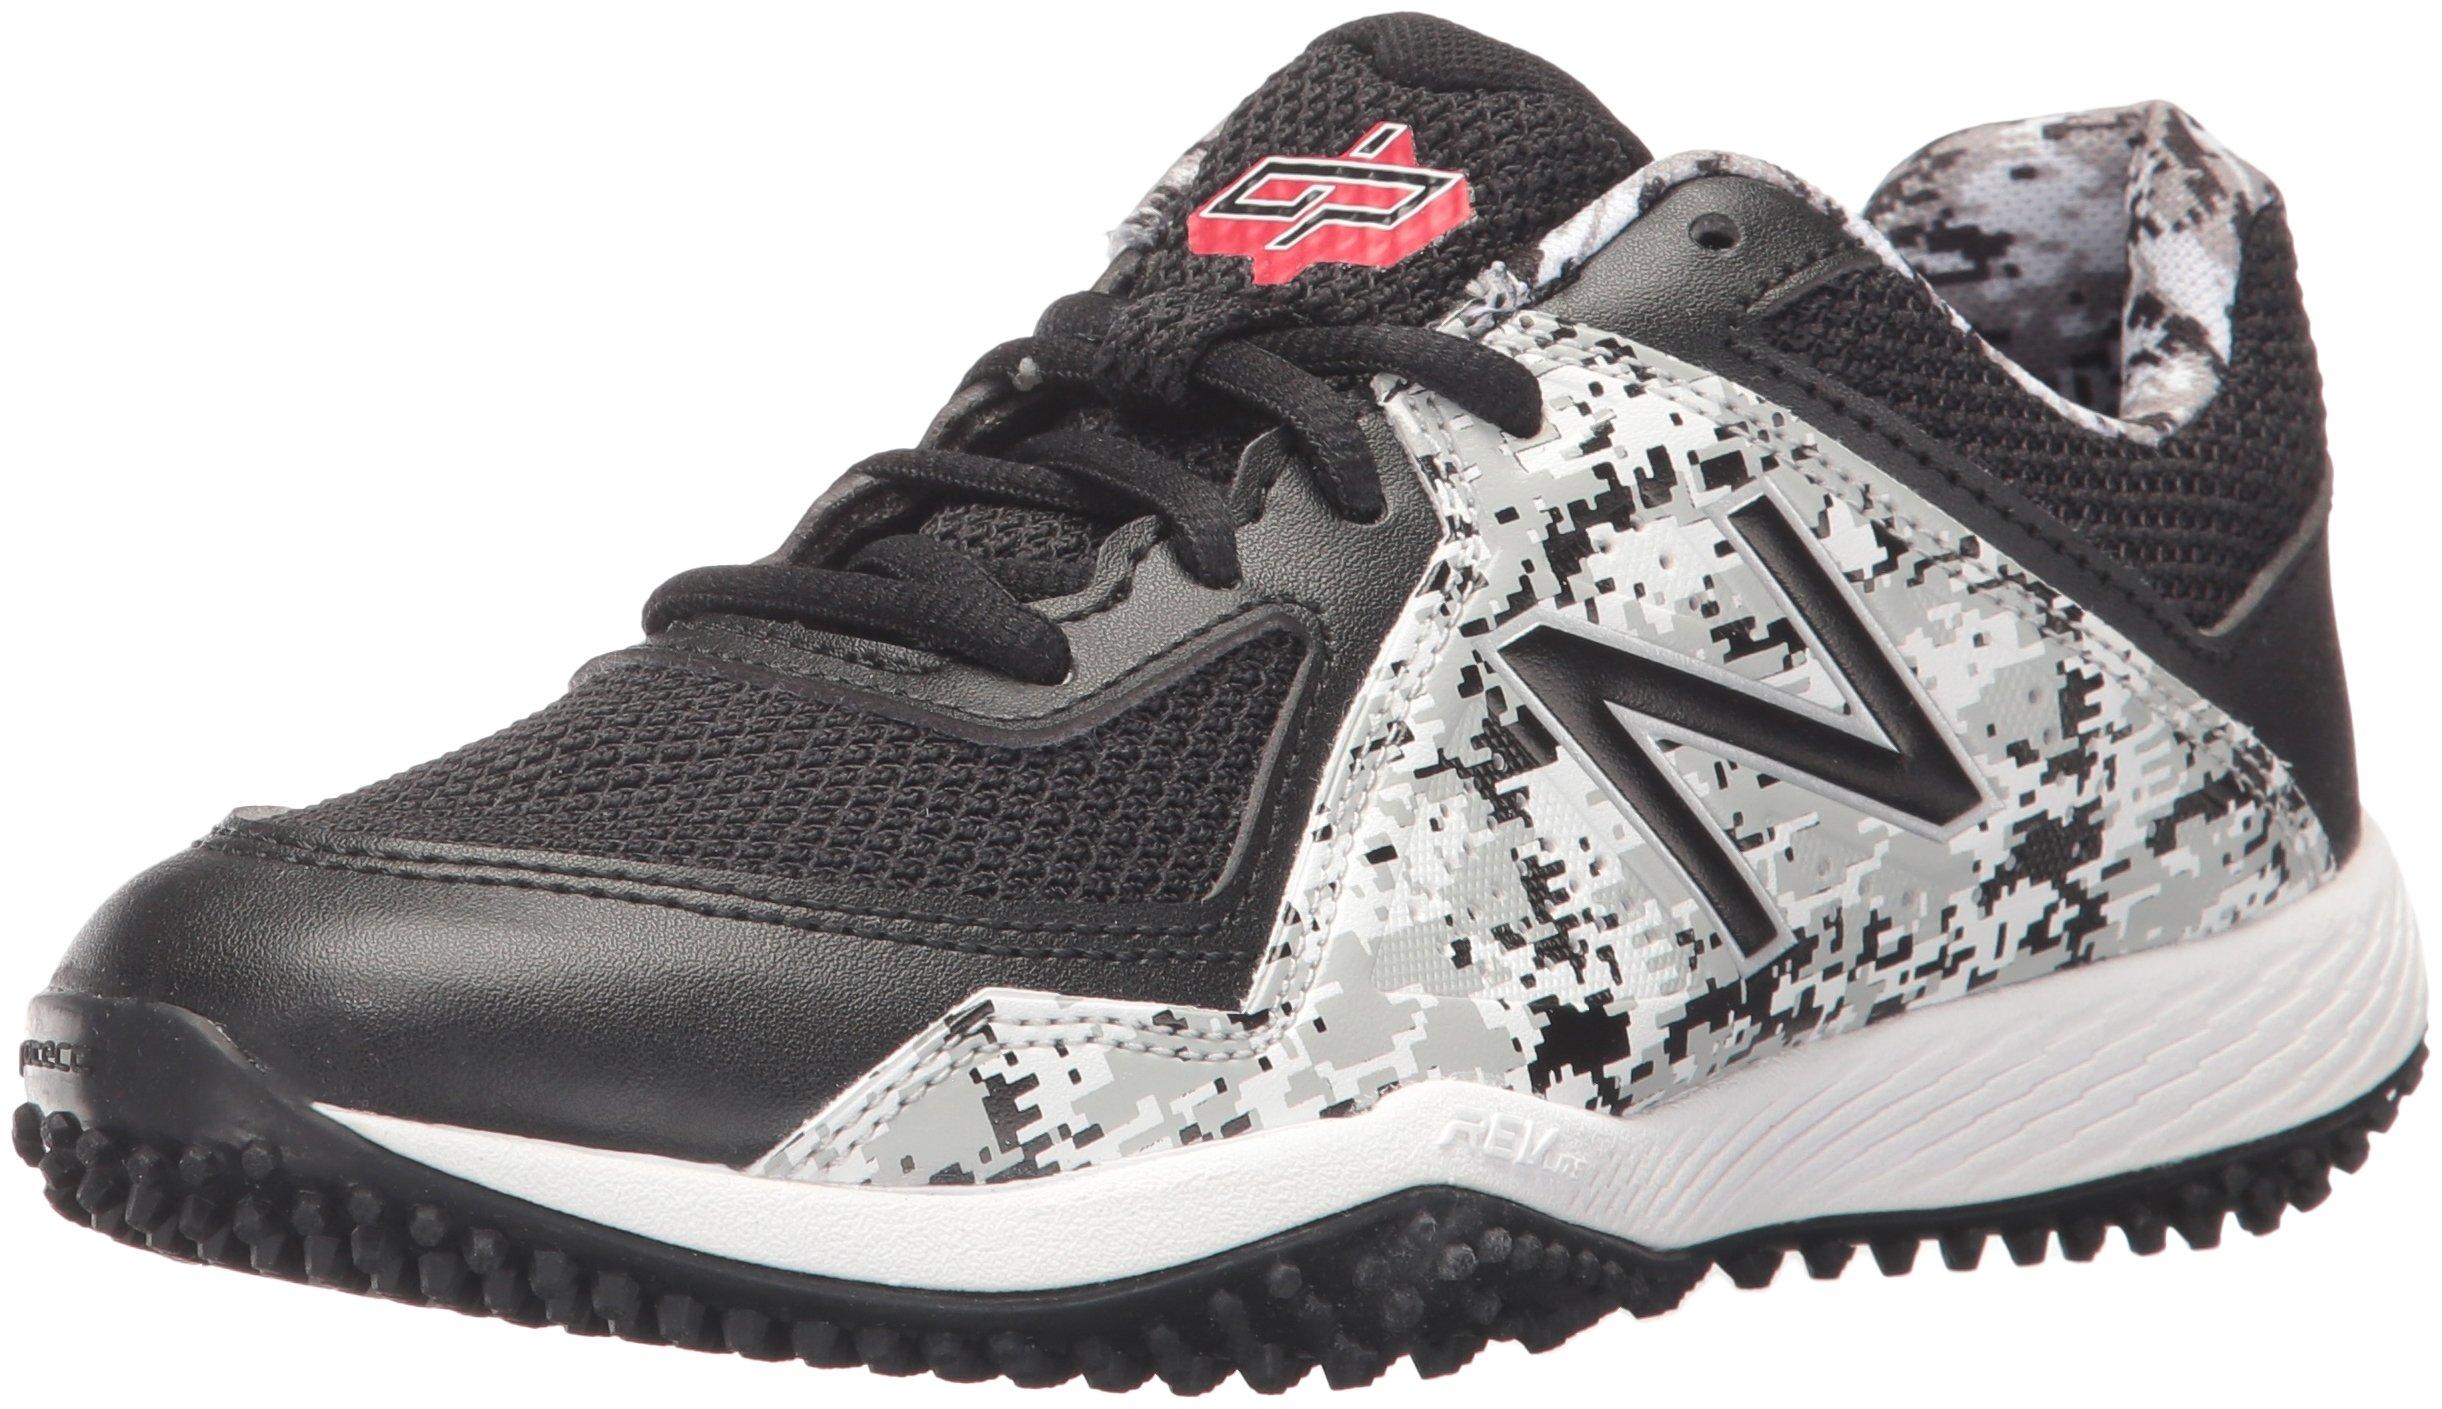 New Balance Boys' TY4040 Turf Baseball Shoe, Black/White, 6 M US Big Kid by New Balance (Image #1)